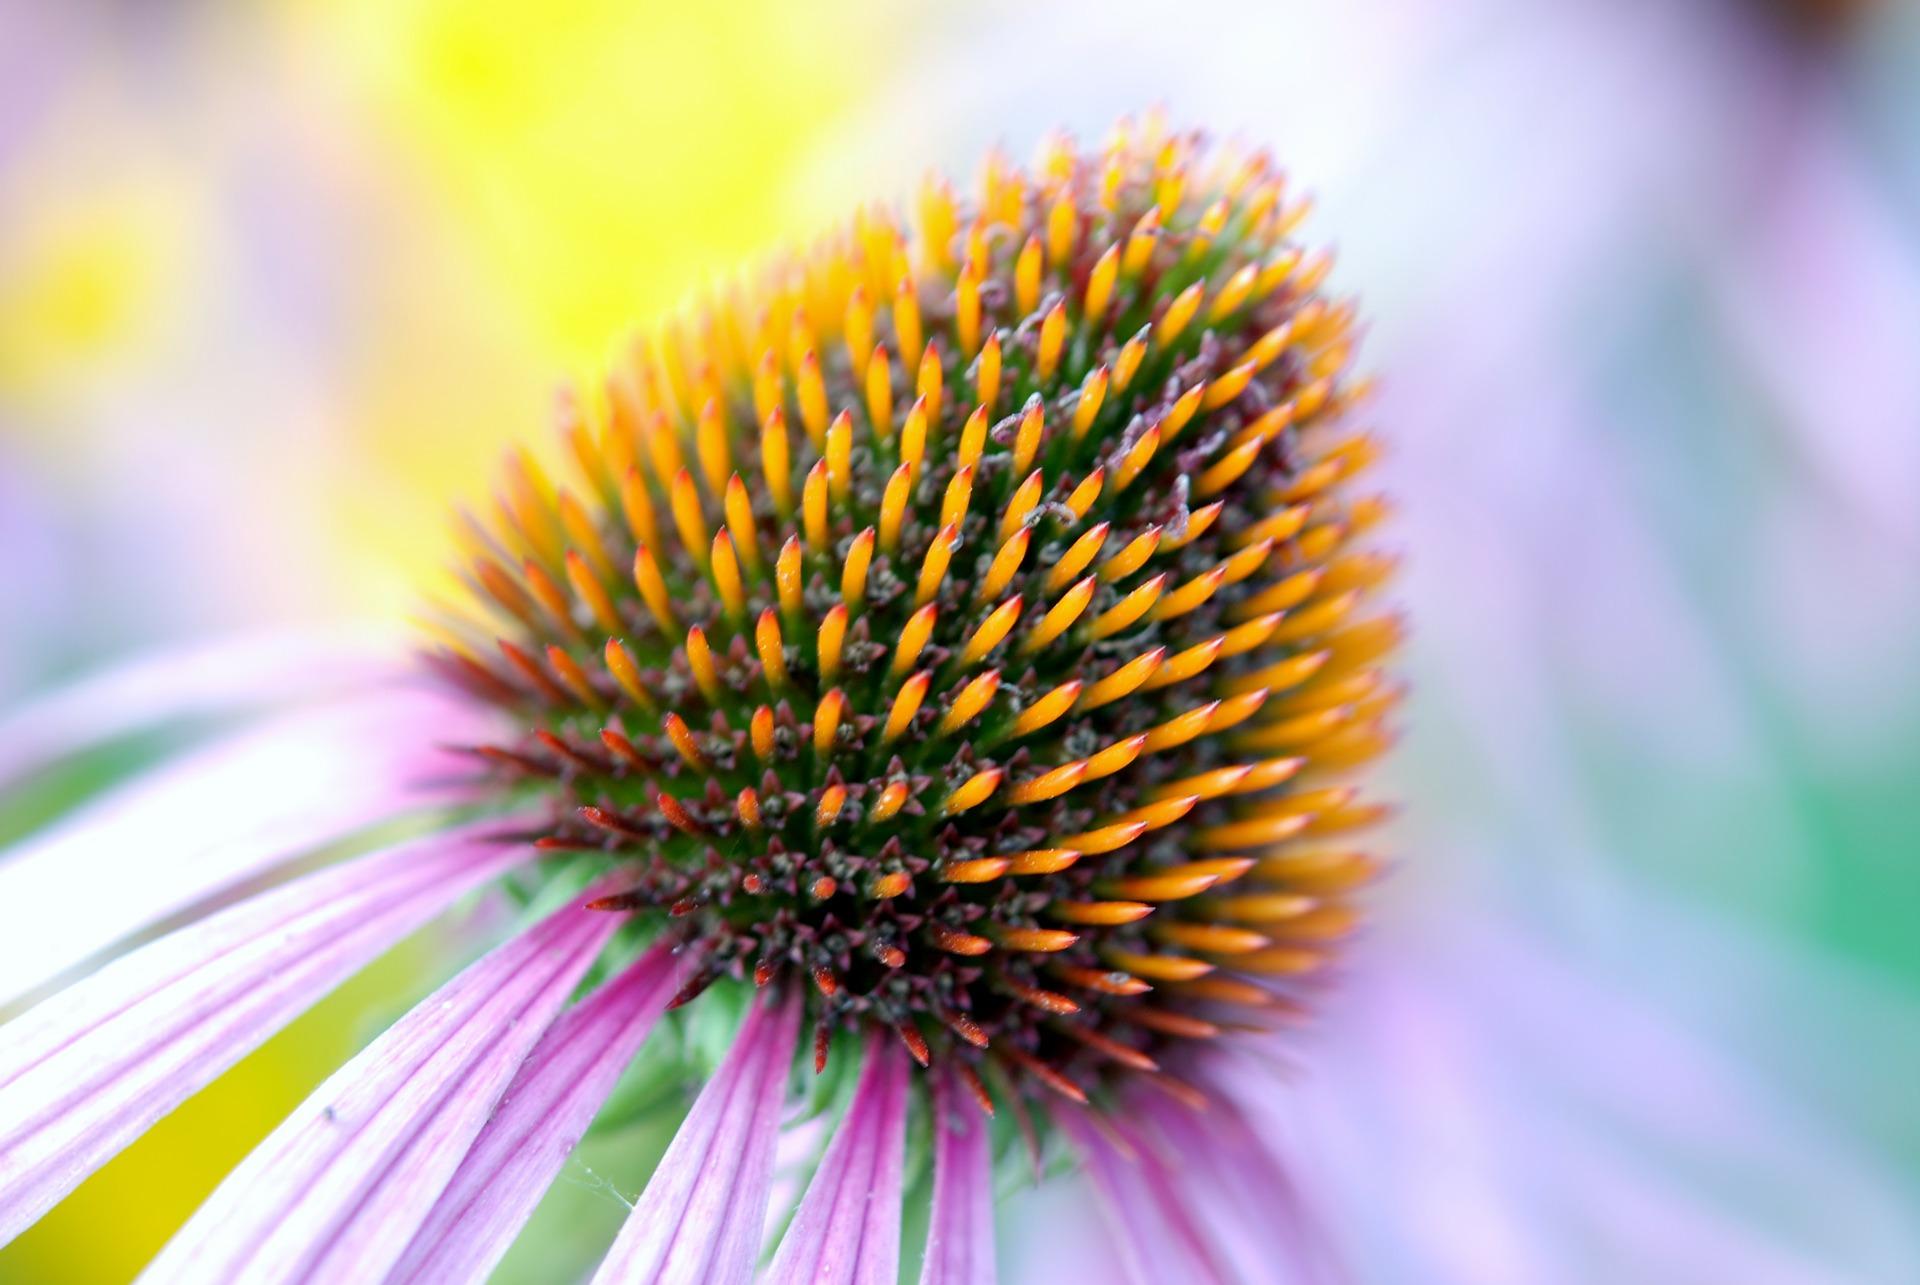 Ehinacea ljekovito bilje - echinacea